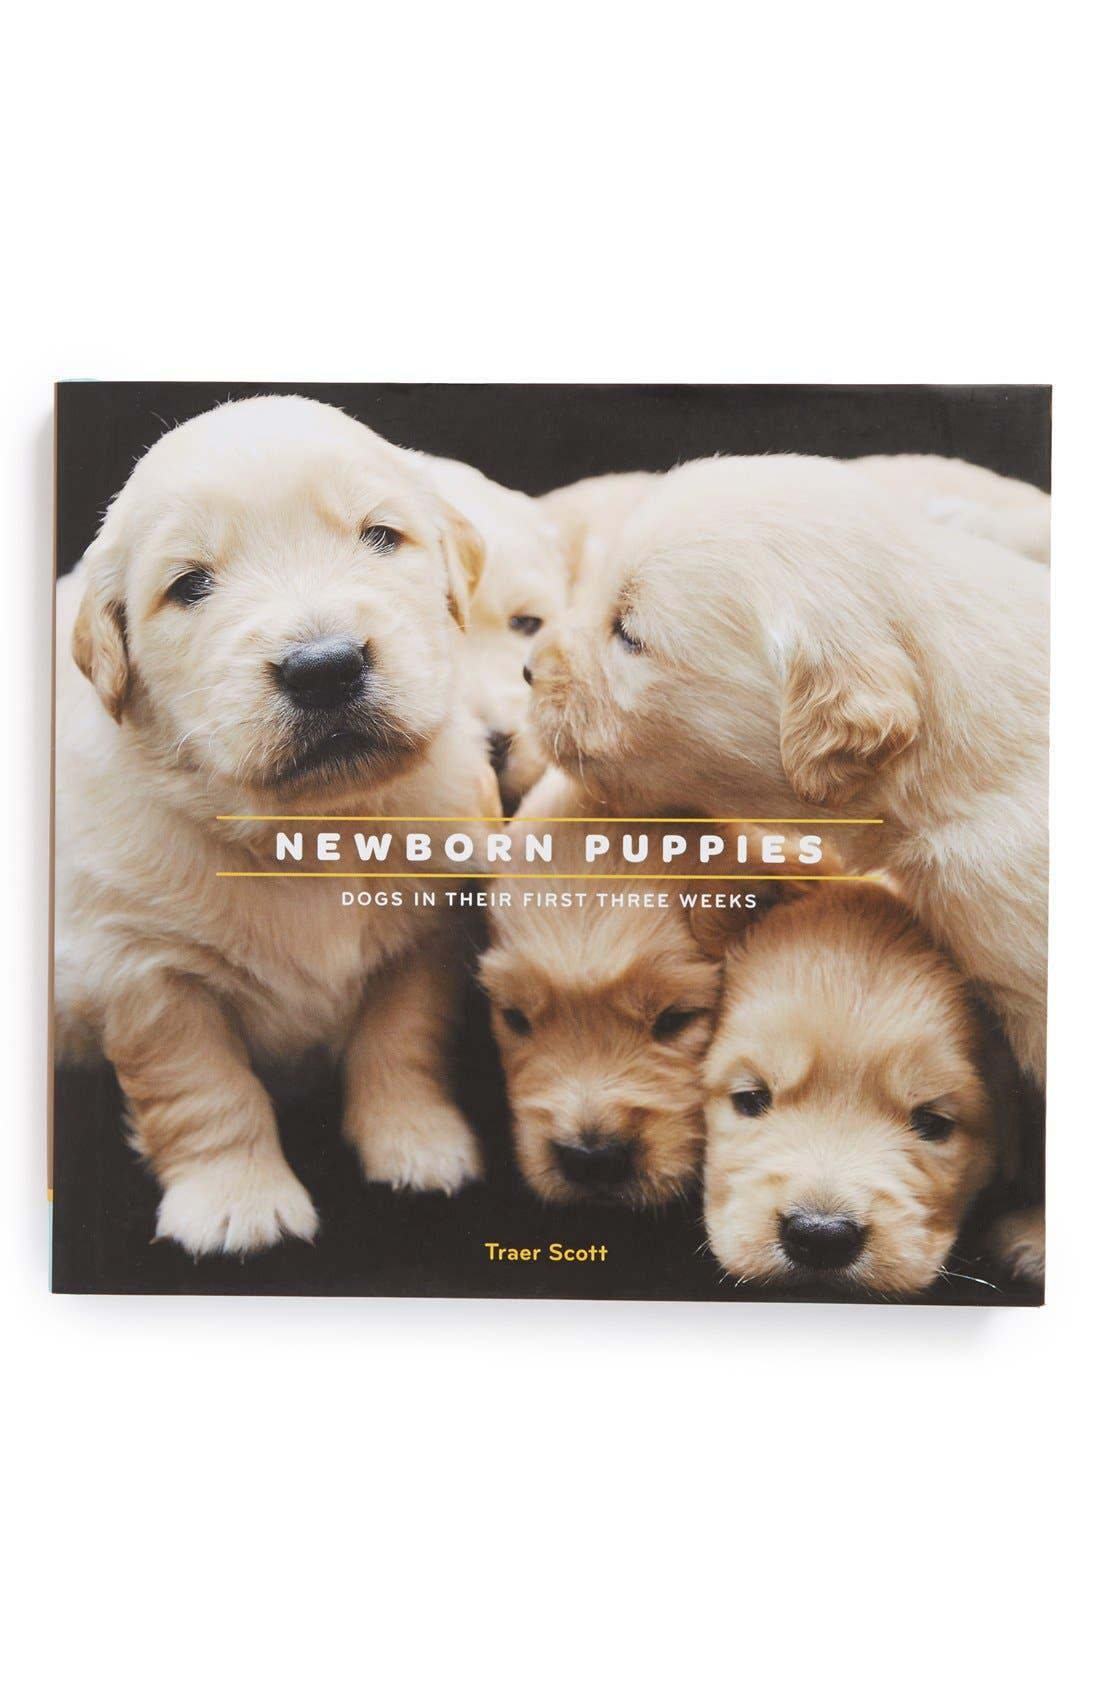 Alternate Image 1 Selected - 'Newborn Puppies' Book